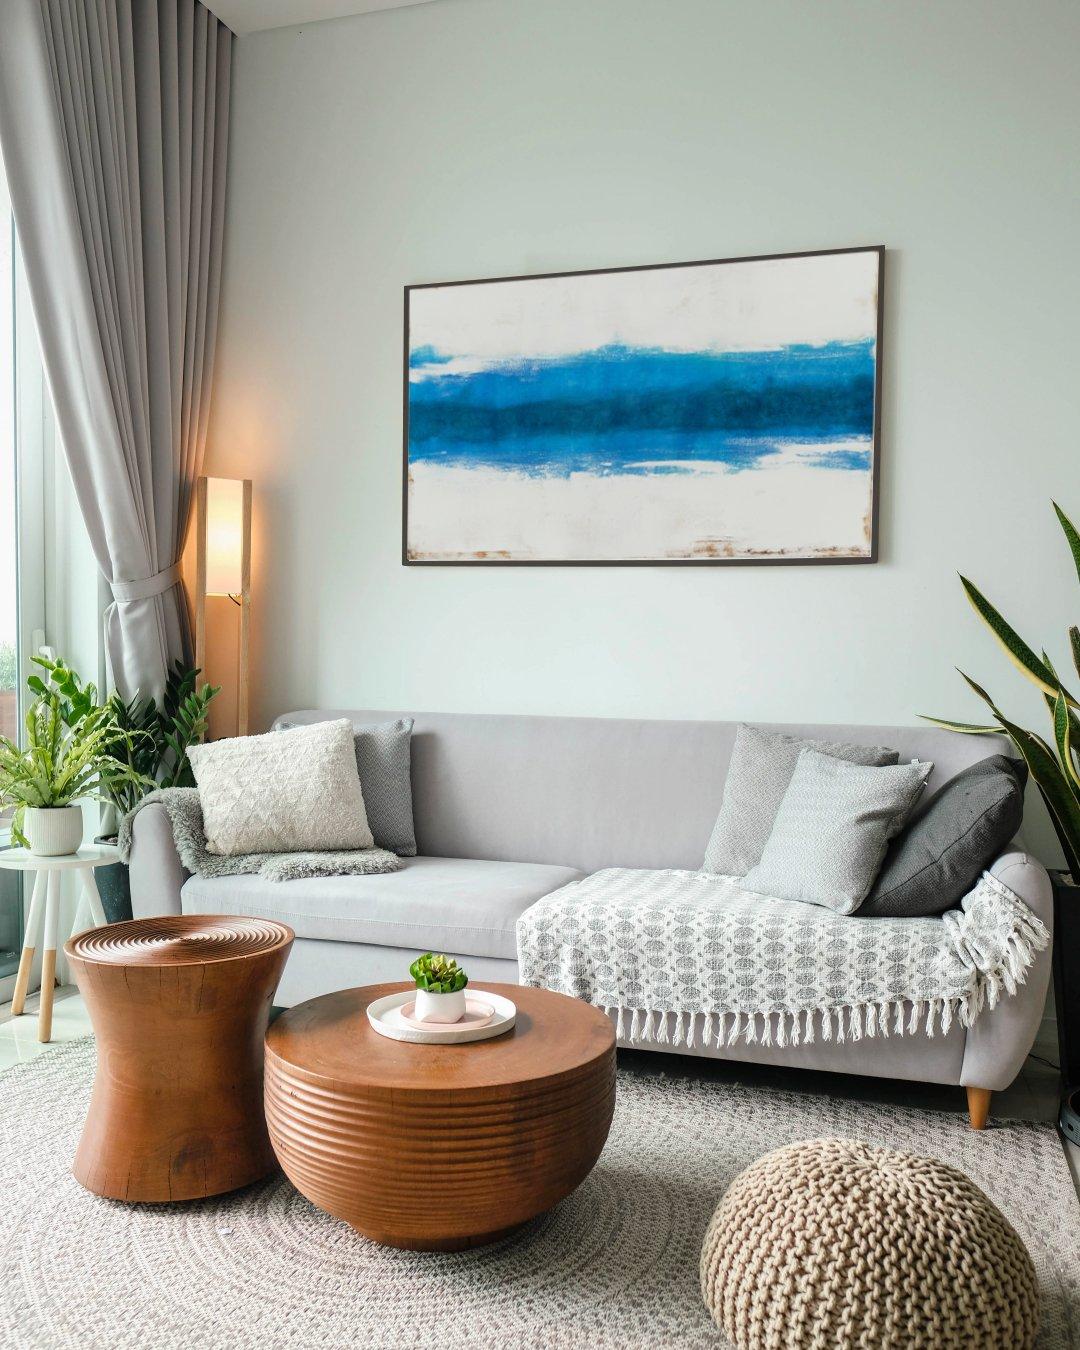 Art in interior design, inspiration, Abstract art, Ocean art, Painting, Wall decor